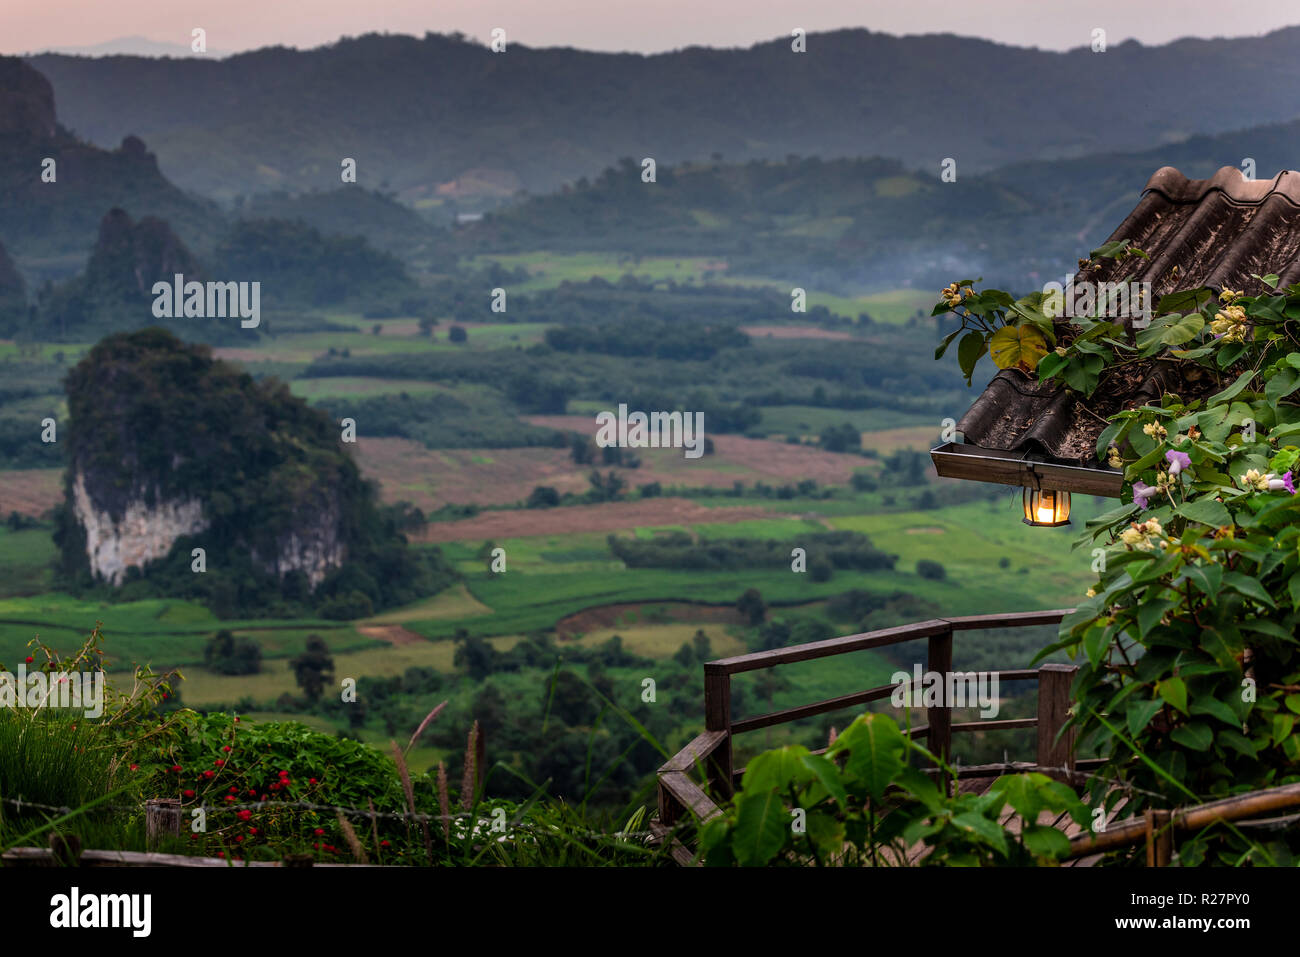 Cafe on the cliff edge. Beautiful scenery. Phu Lanka, Thailand - Stock Image